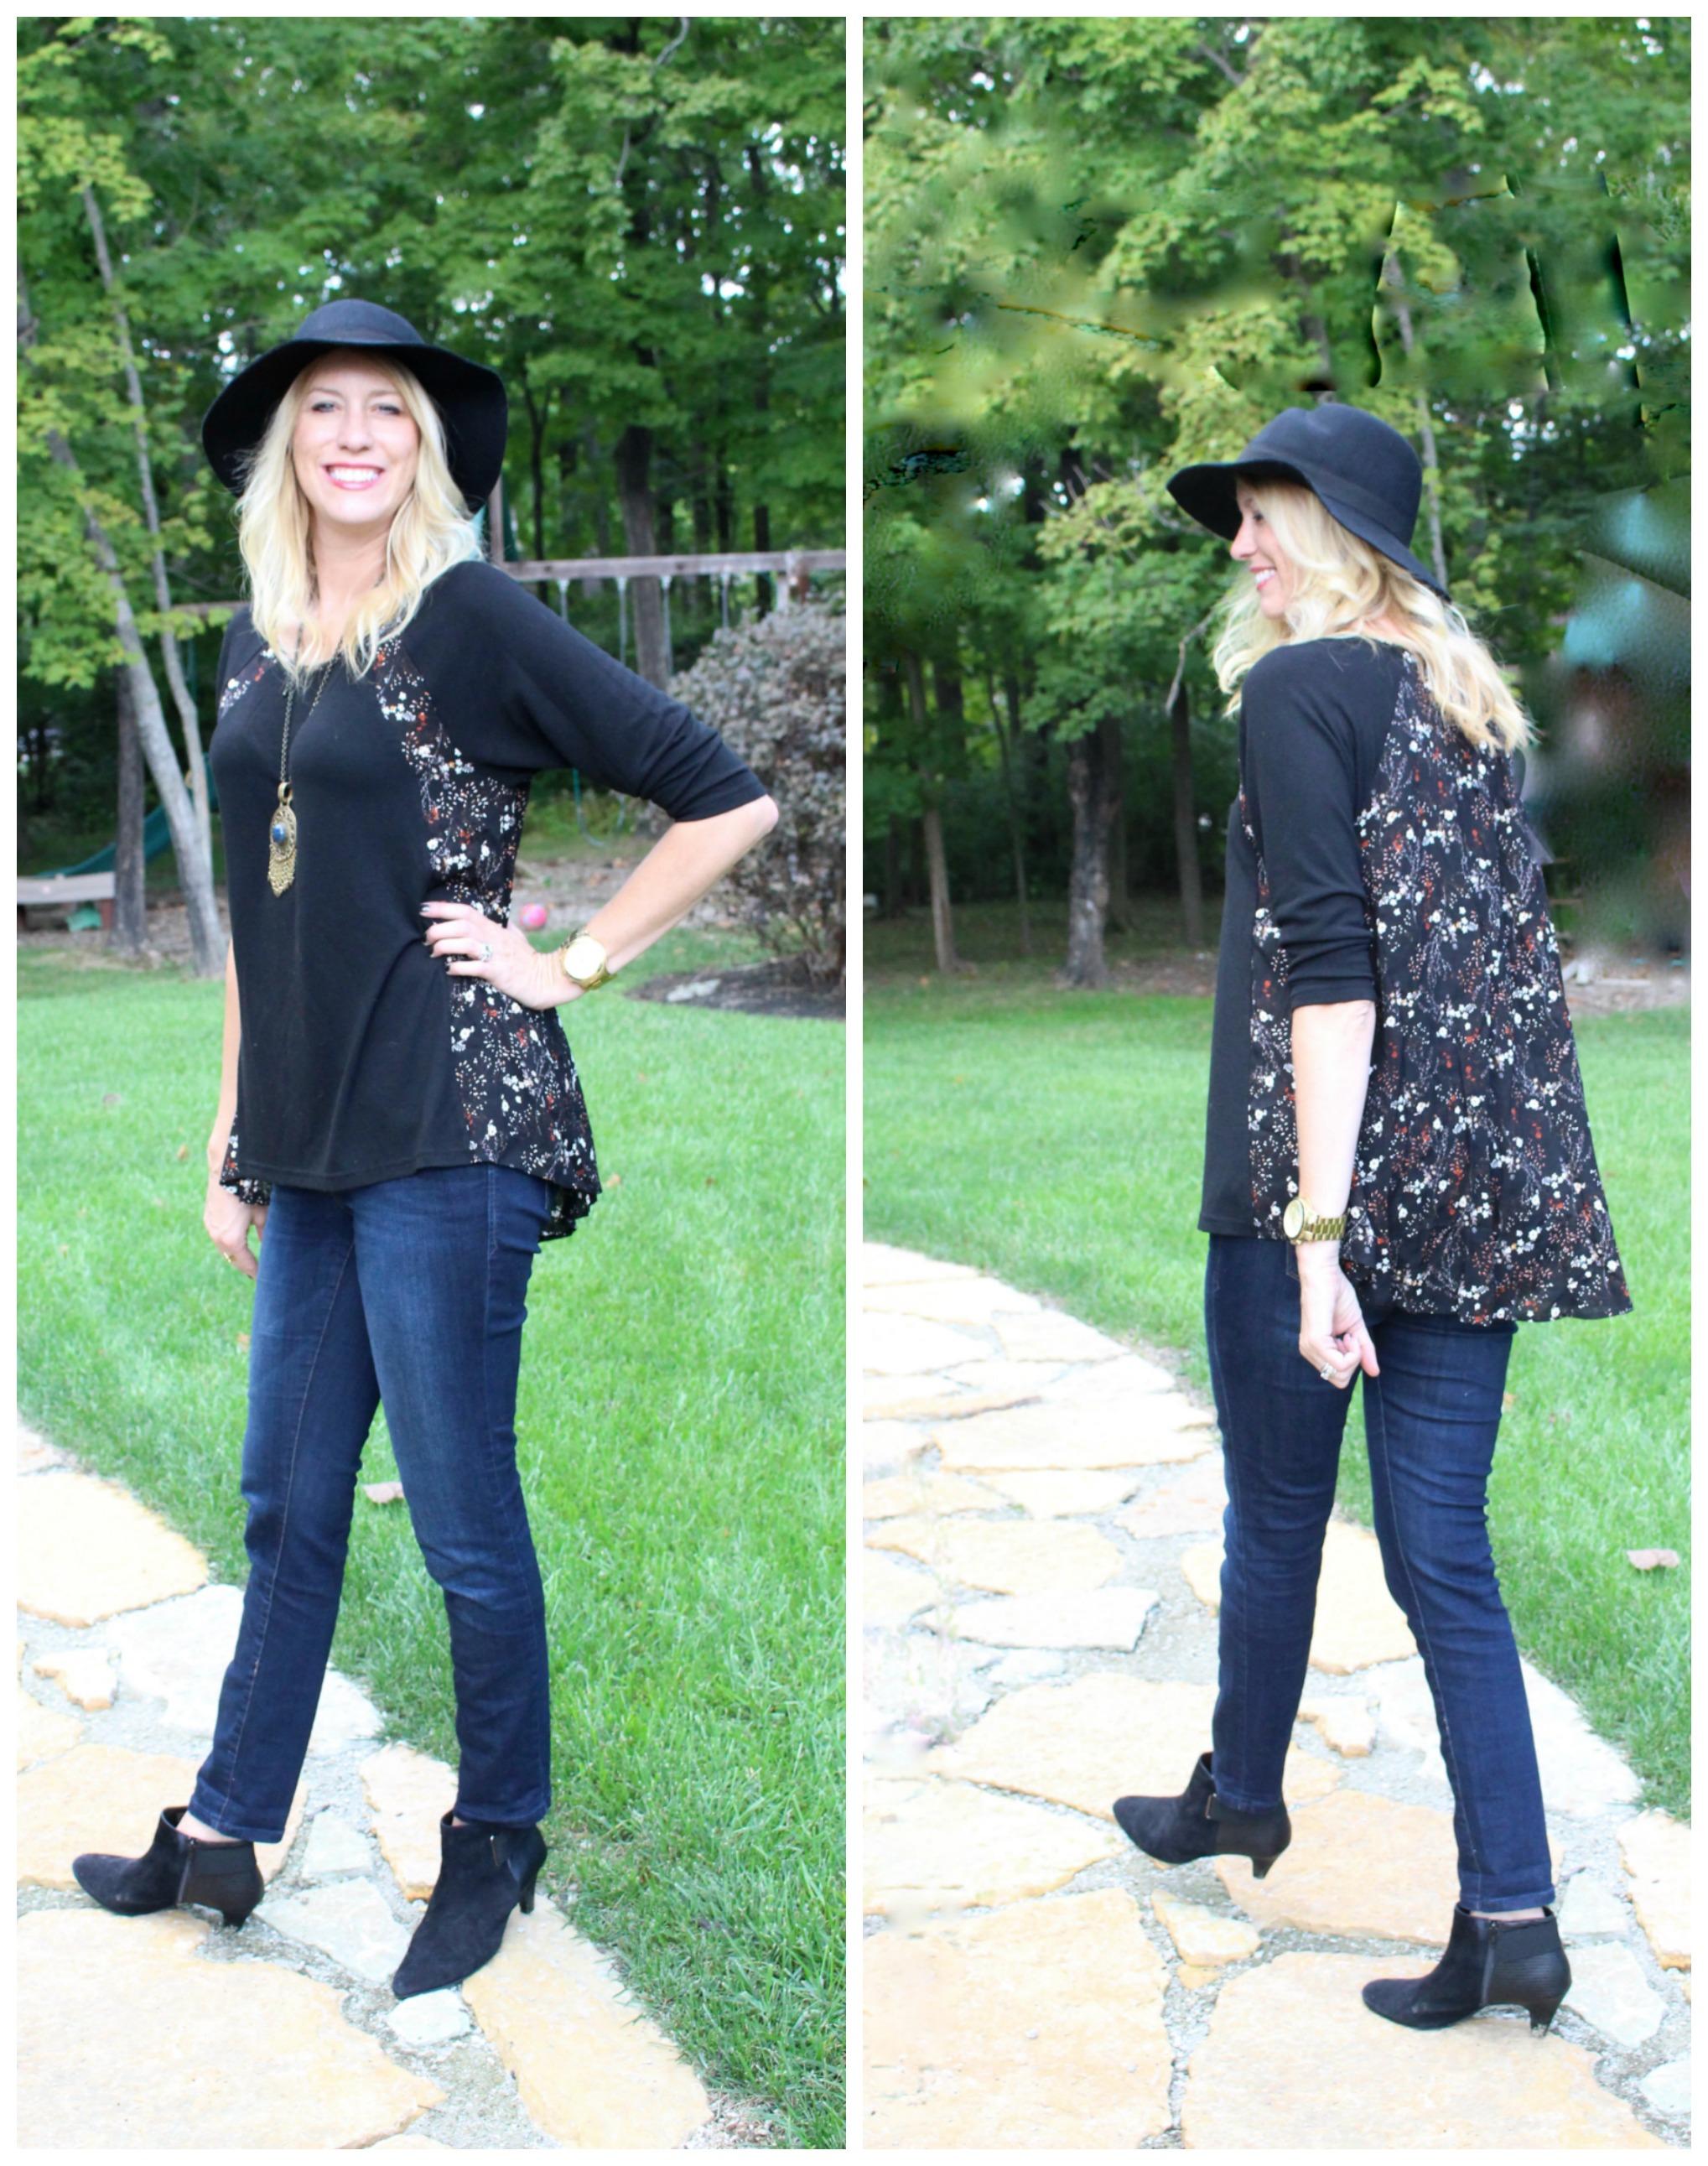 glamour-farms-black-top-fashion- women's fashion- fall wardrobe- clothing- floral top